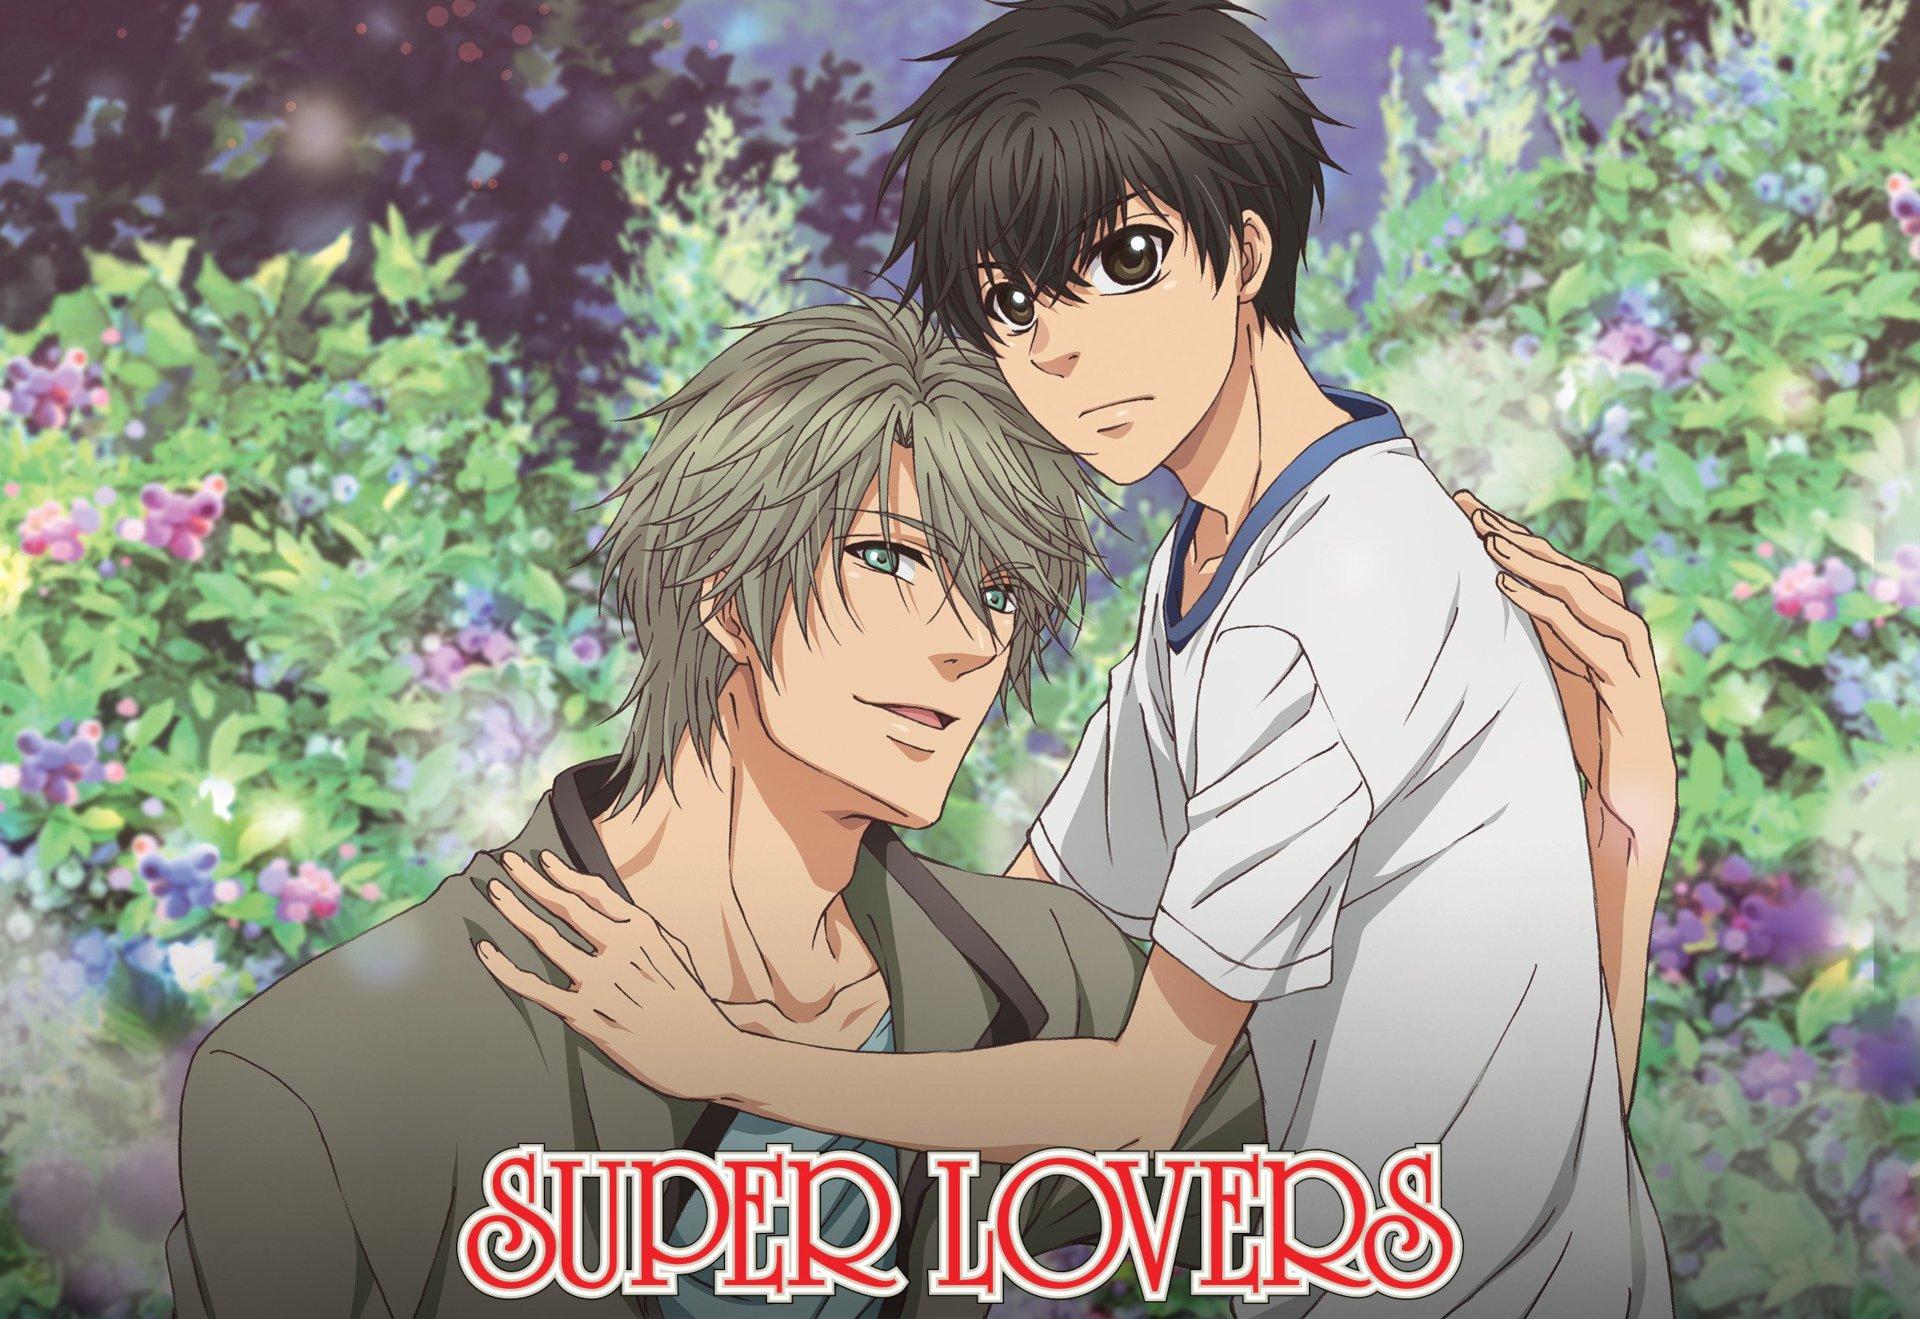 Super lovers   Club Shôjo